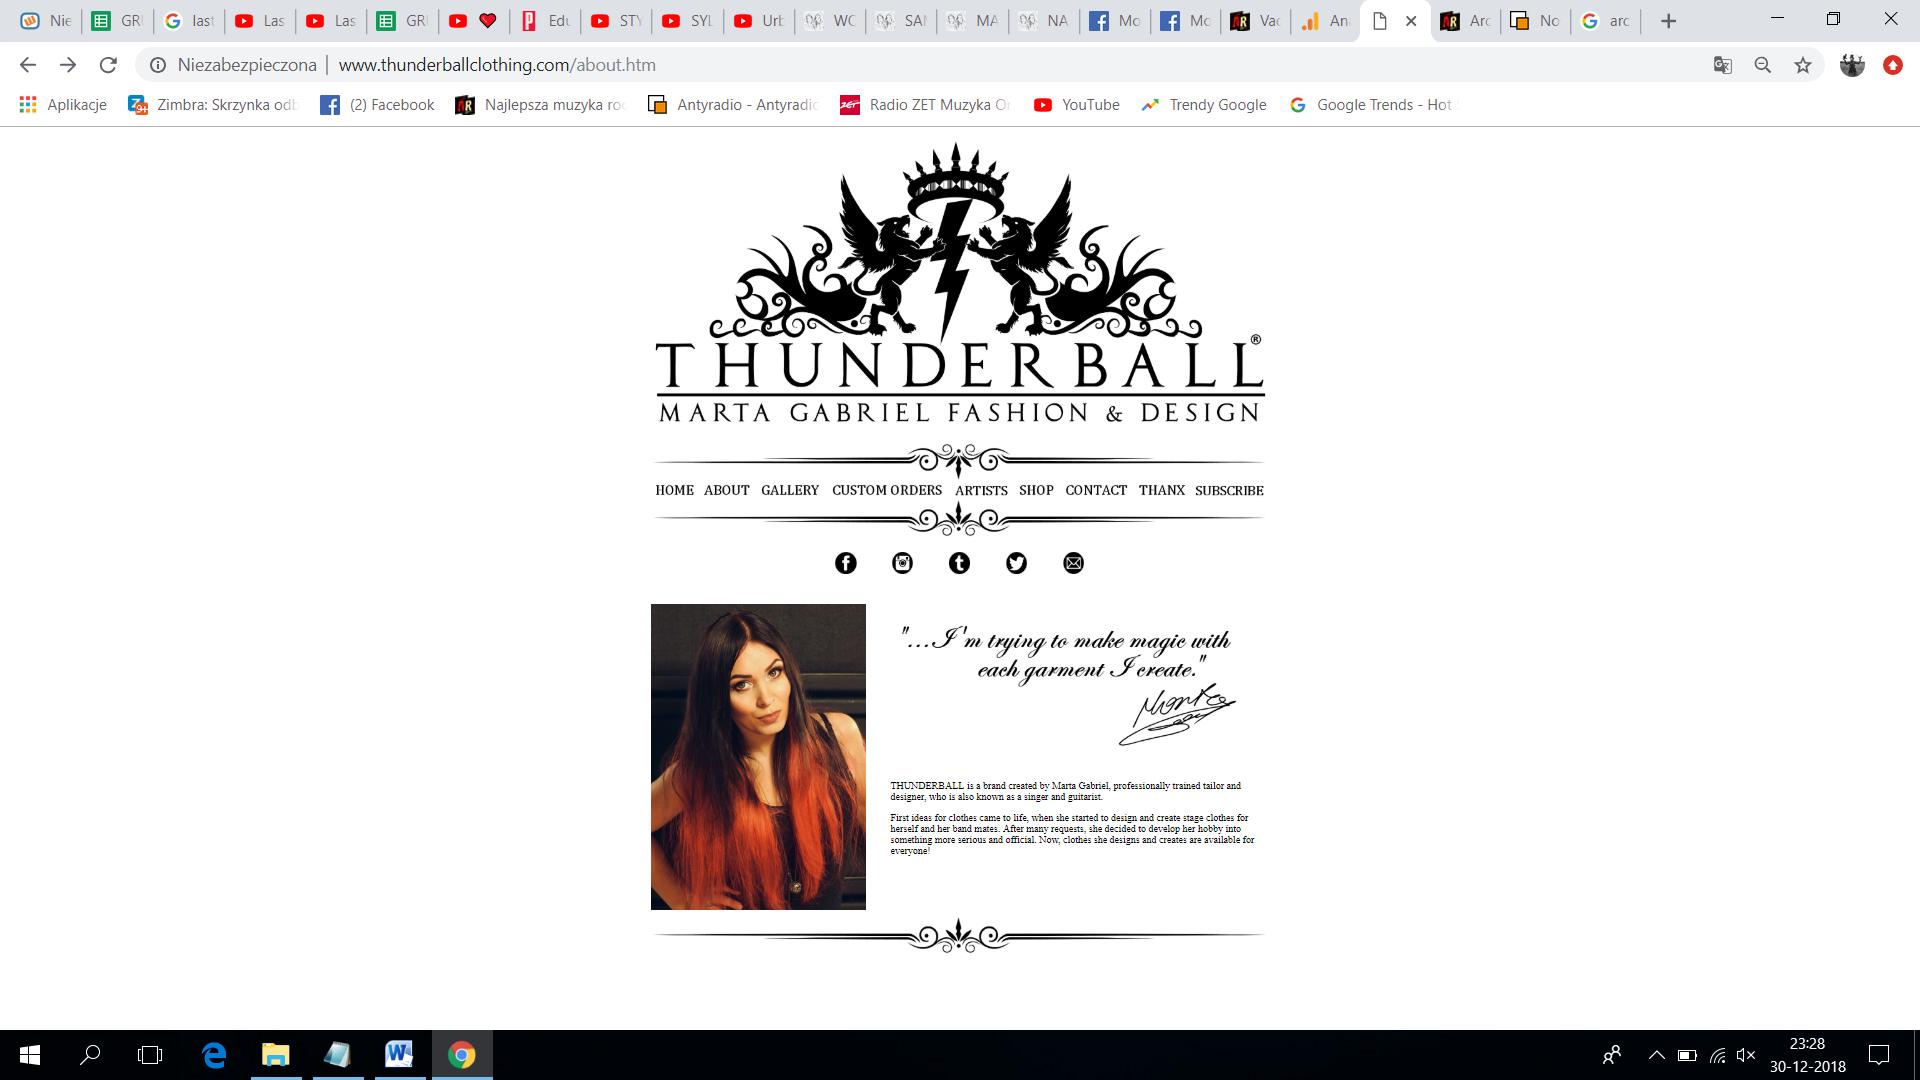 Thunderball Clothing1